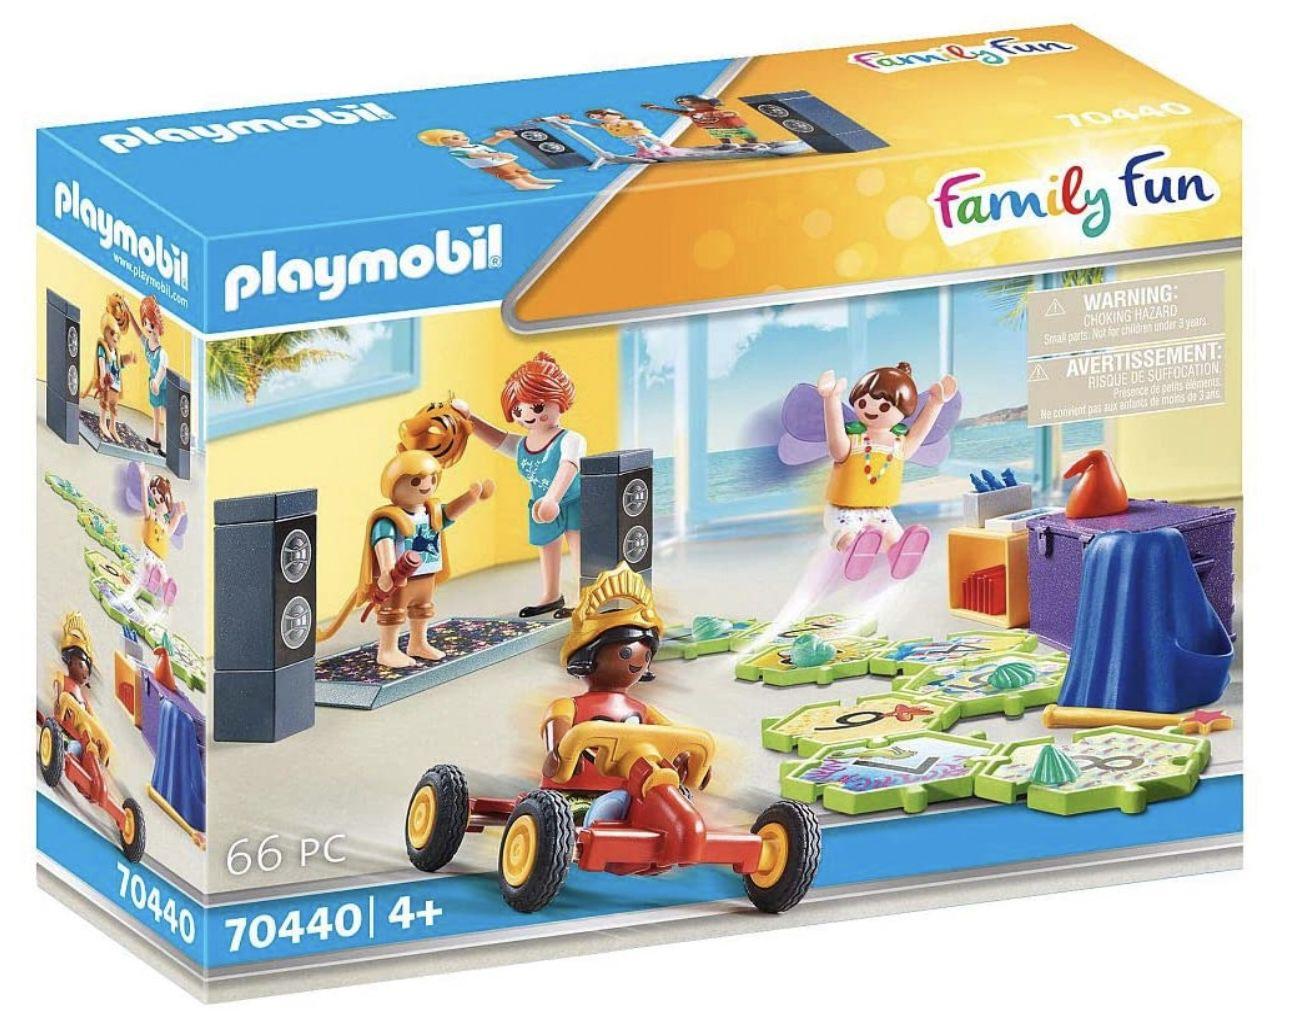 PLAYMOBIL 70440 Family Fun Kids Club für 8,49€ (statt 11€)   Prime